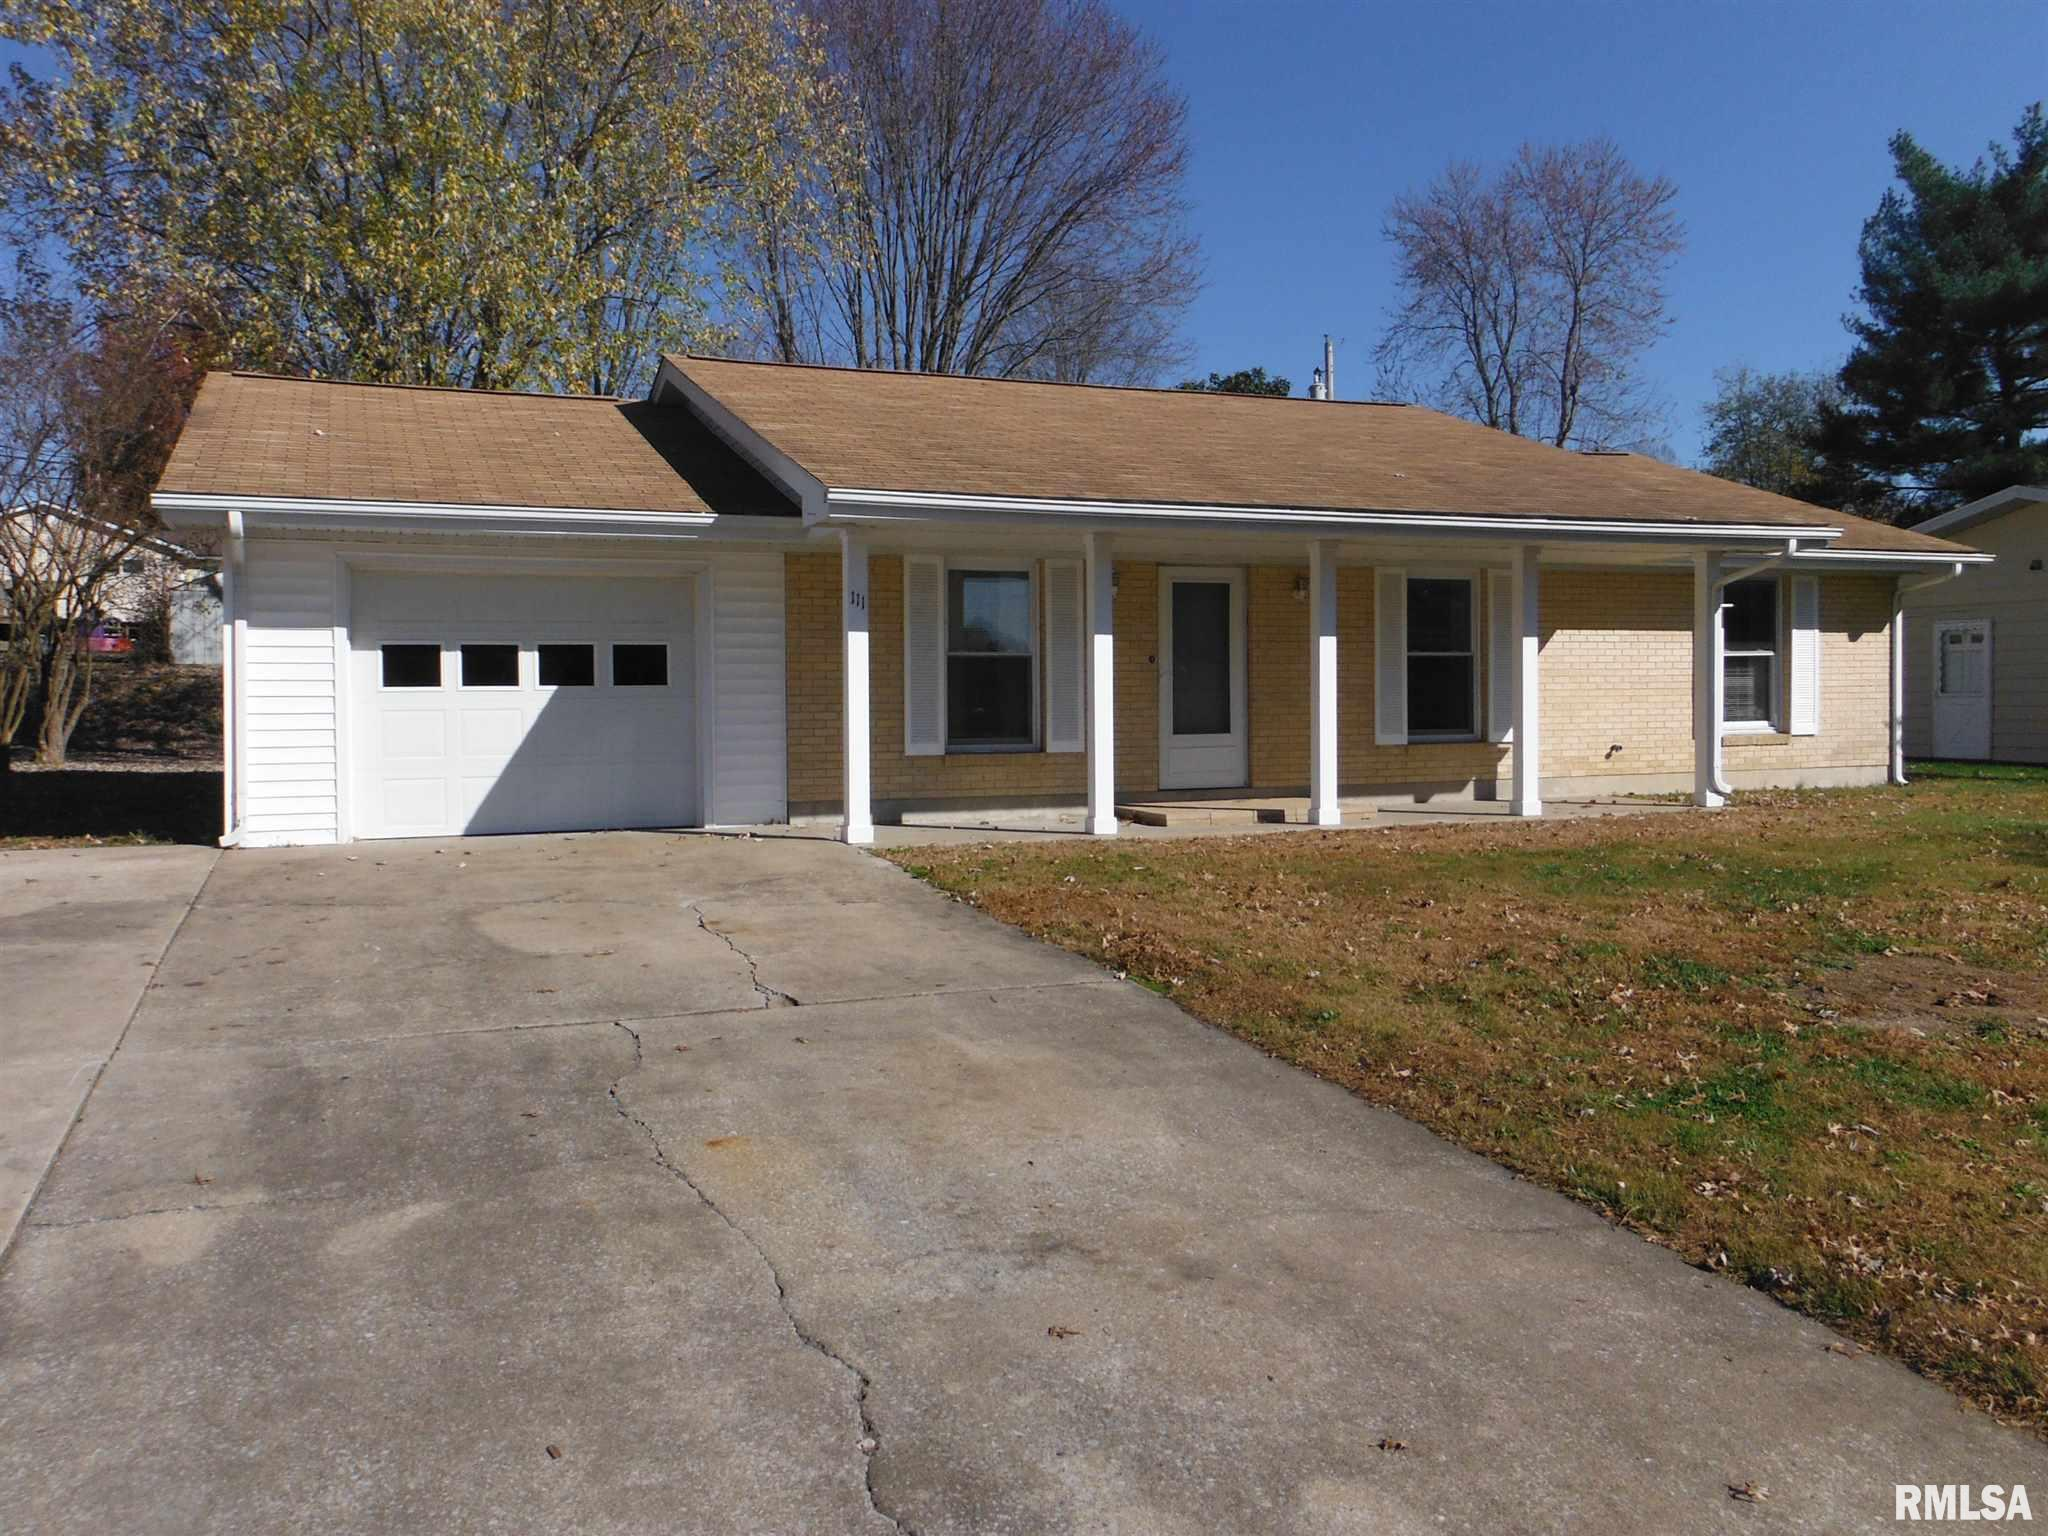 111 EVERGREEN Property Photo - Anna, IL real estate listing